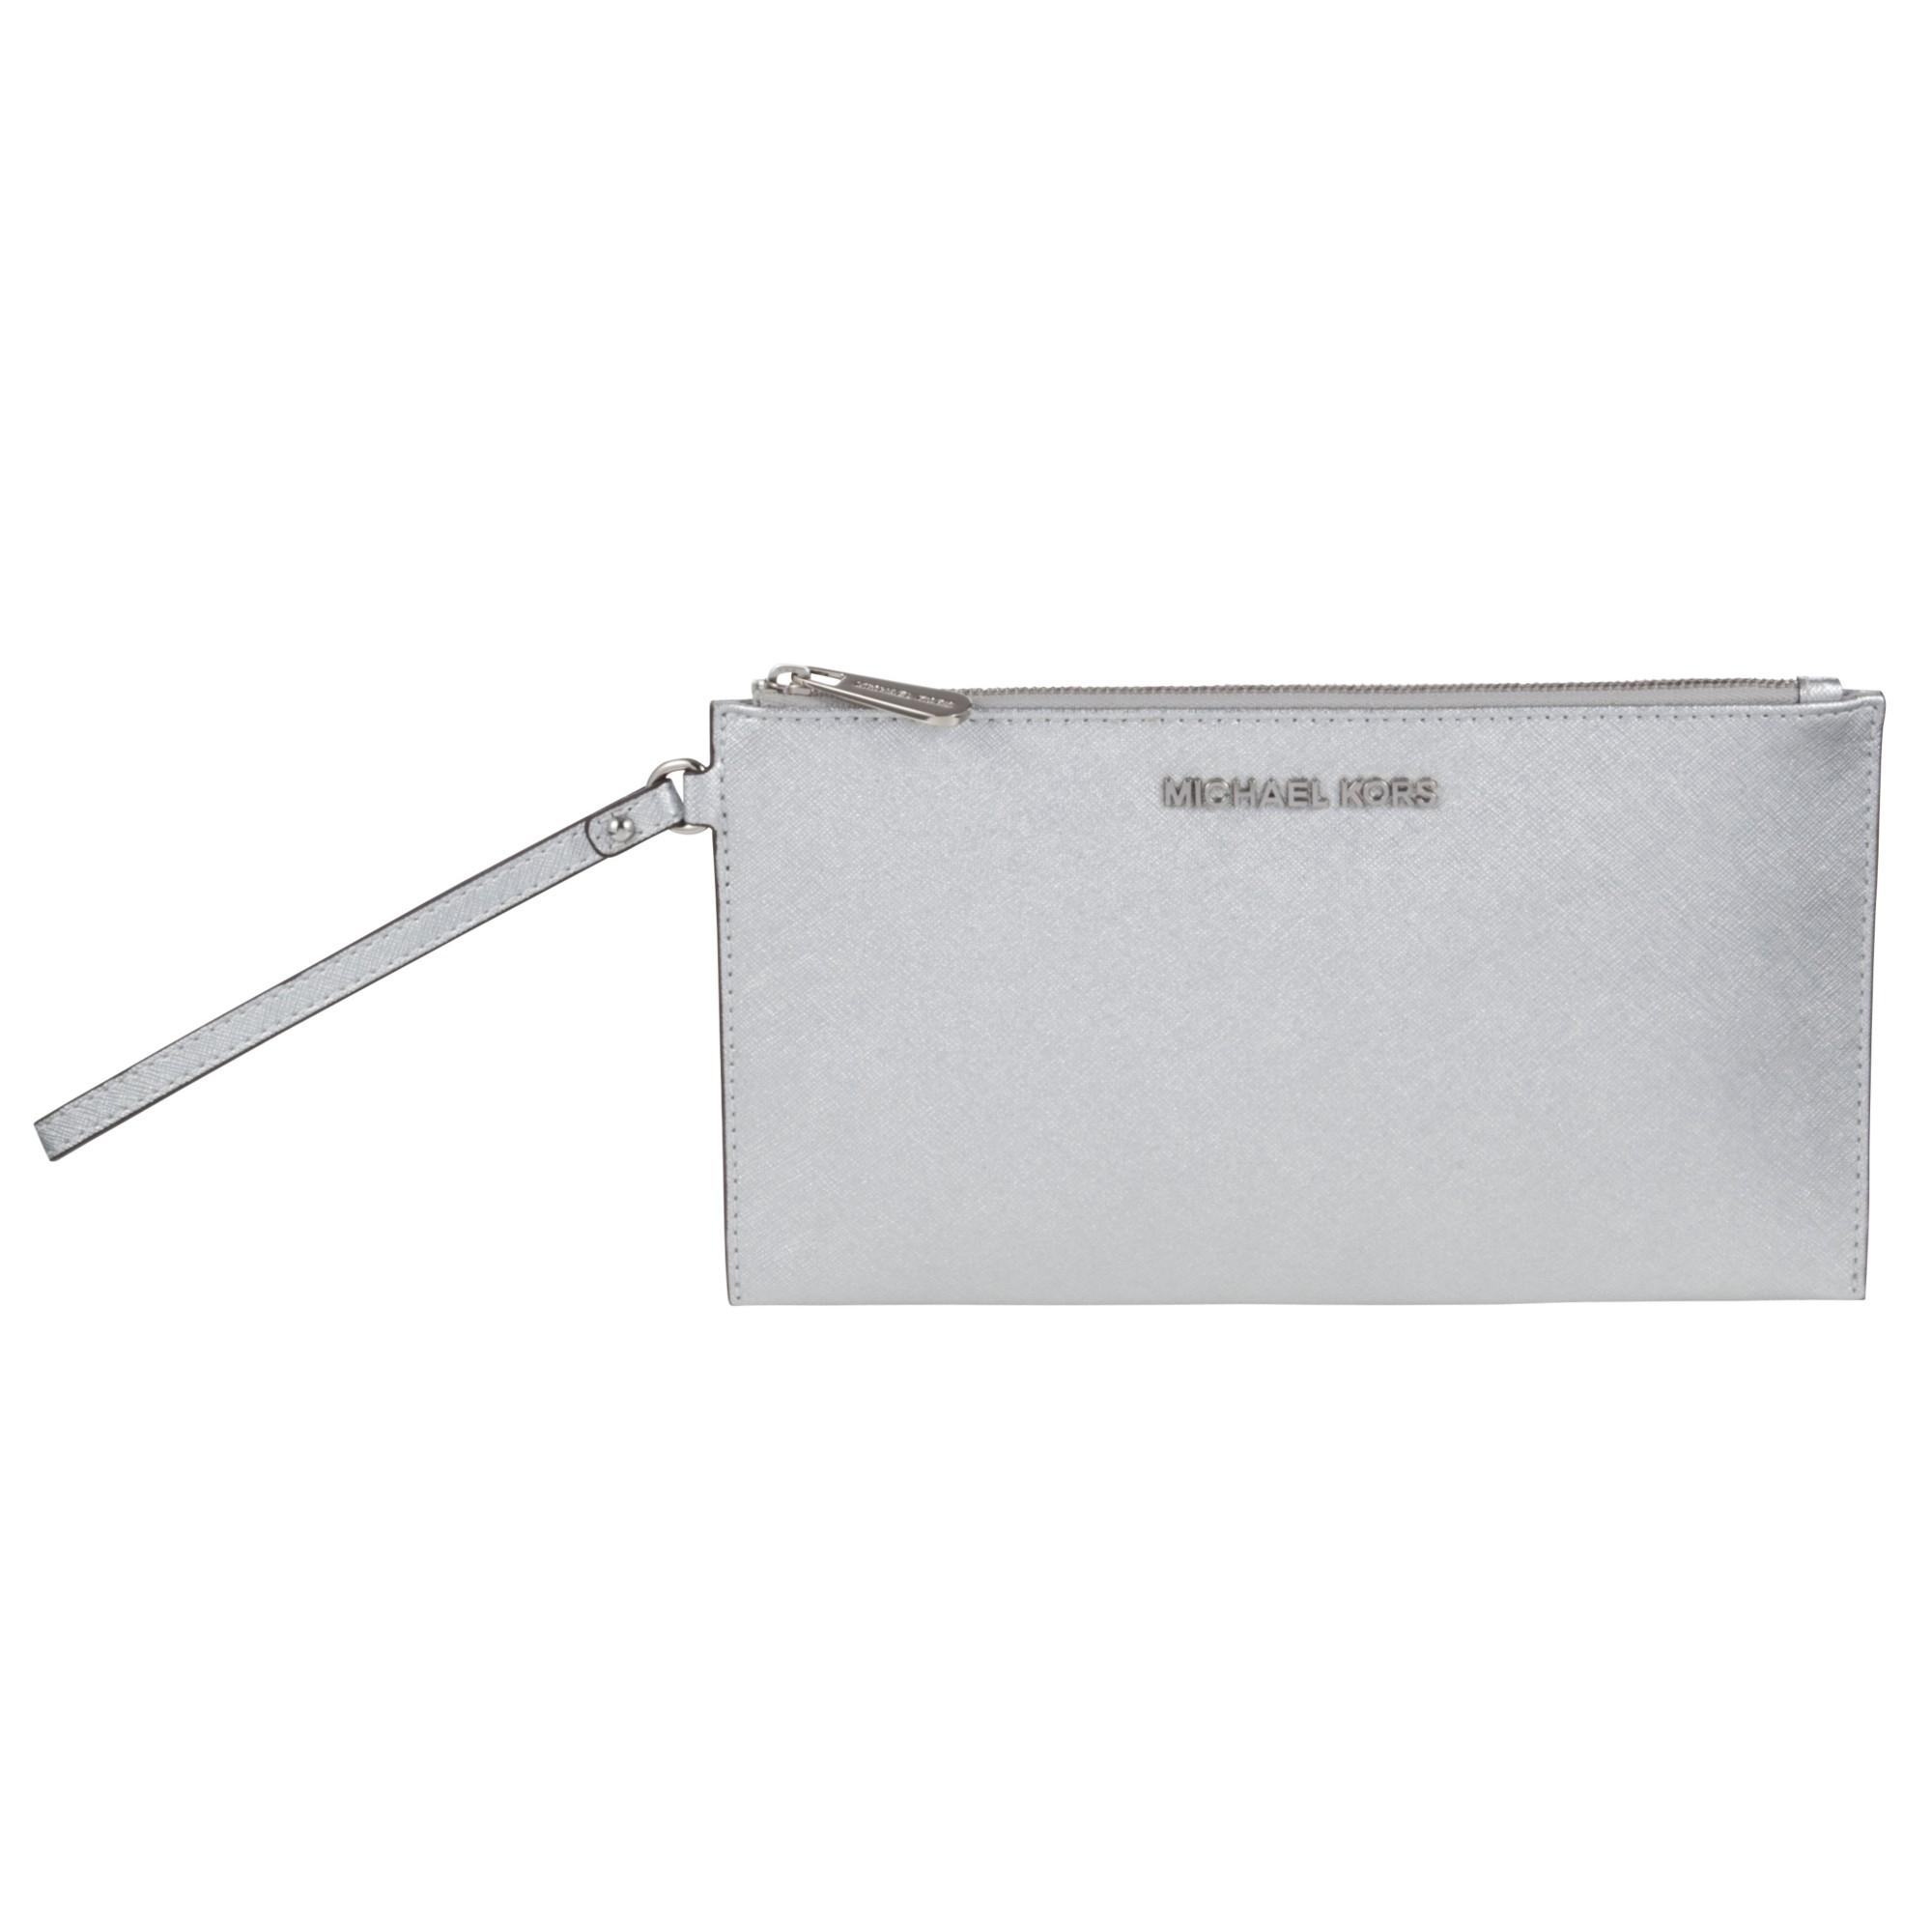 73fa248ecdeb MICHAEL Michael Kors Jet Set Travel Zip Leather Clutch Bag in ...